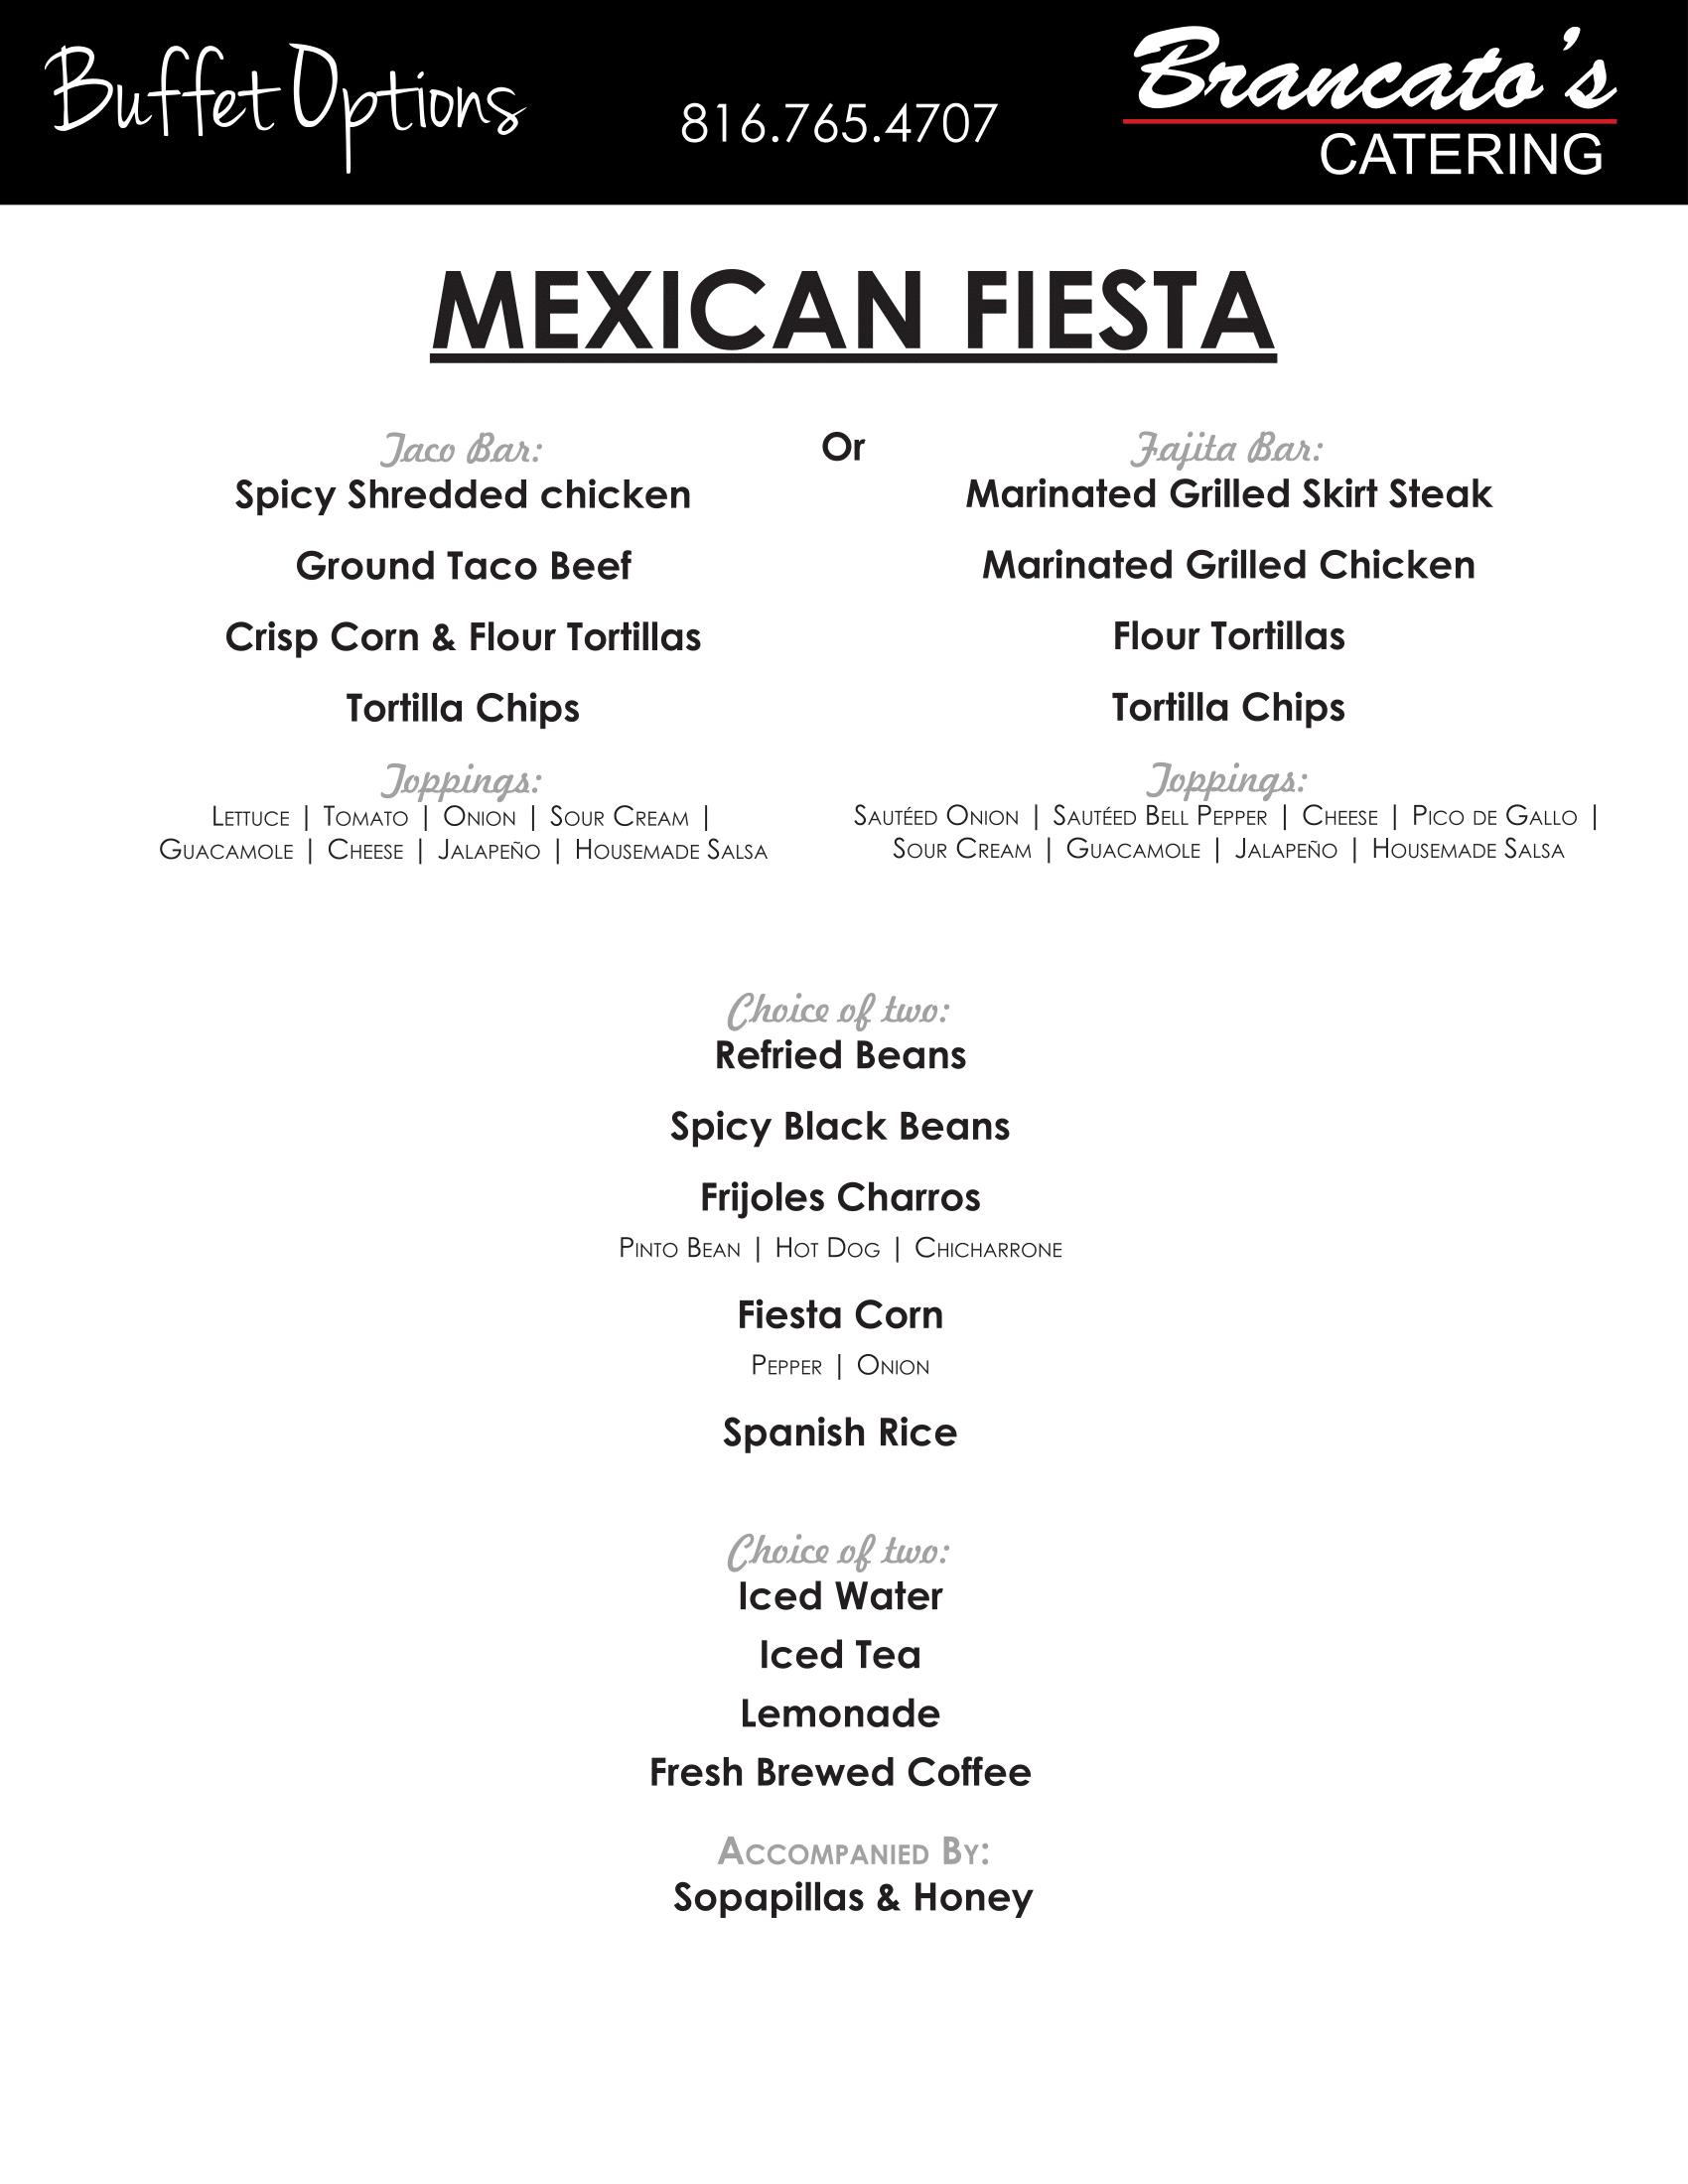 mexican fiesta catering kansas city kansas city